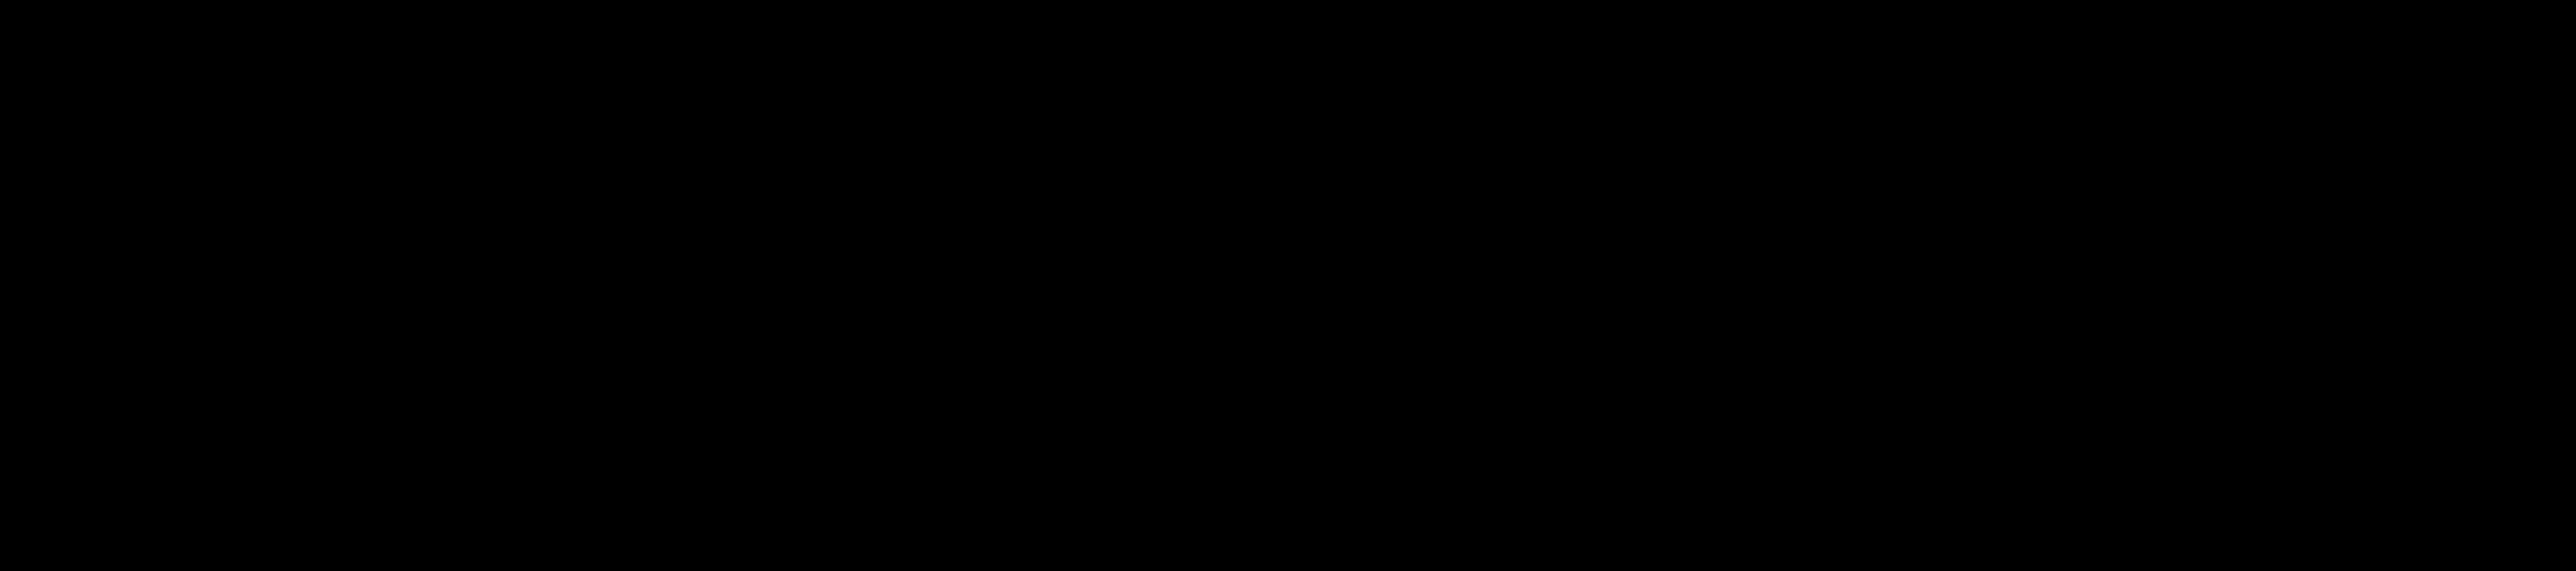 Di-O-Valinoylcurcumin